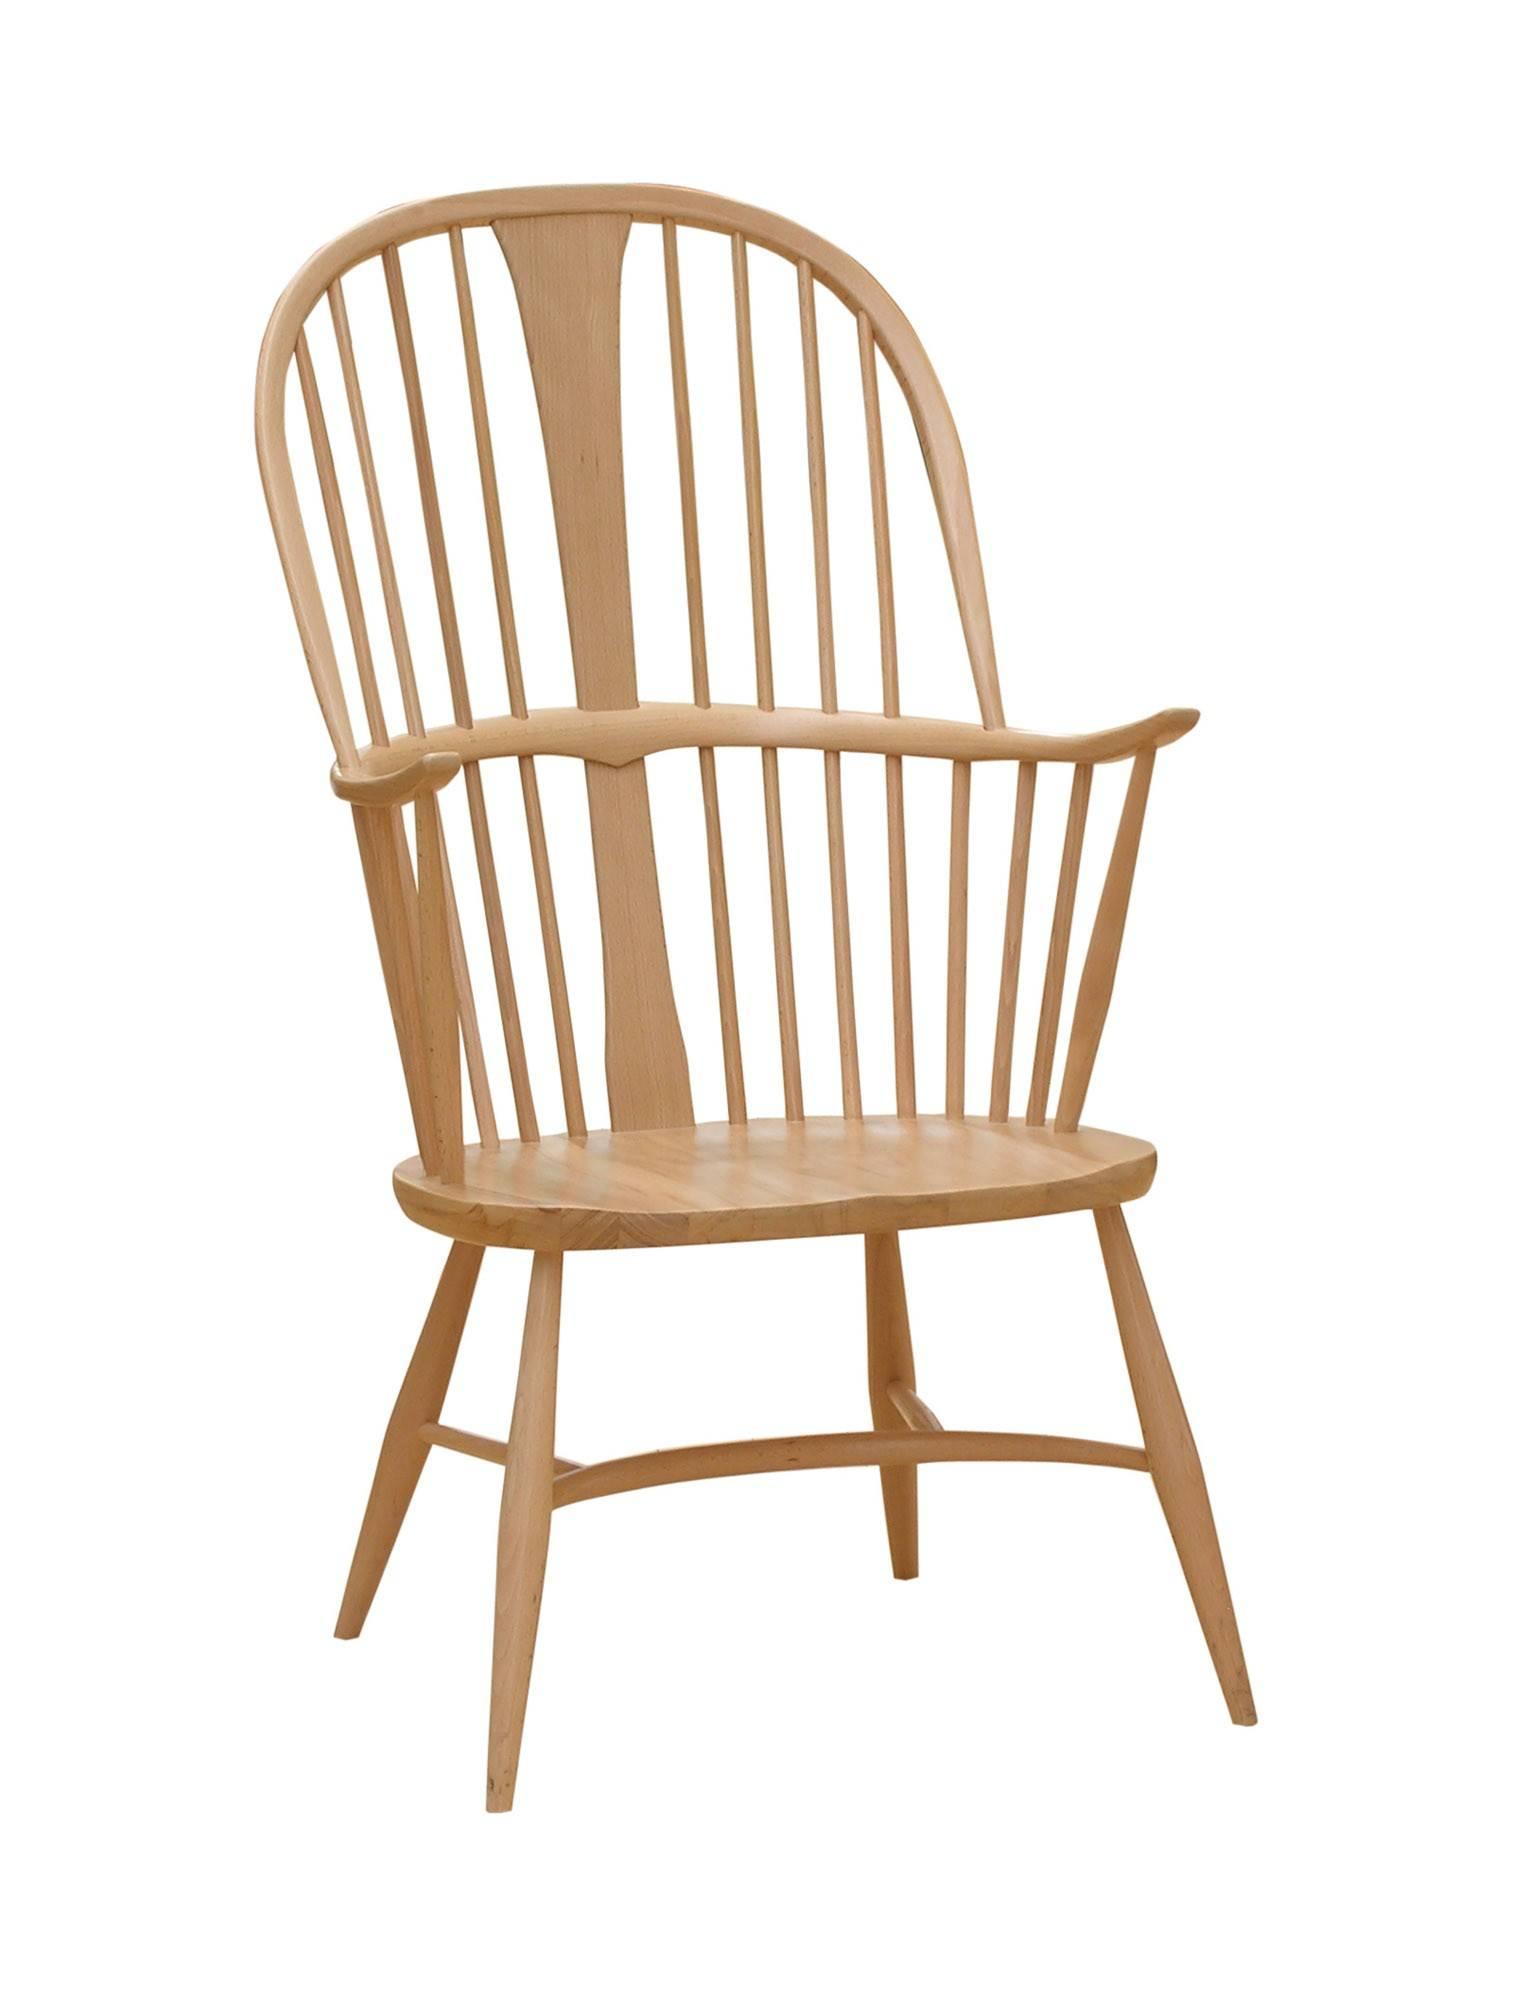 Ercol Originals 911 Chair